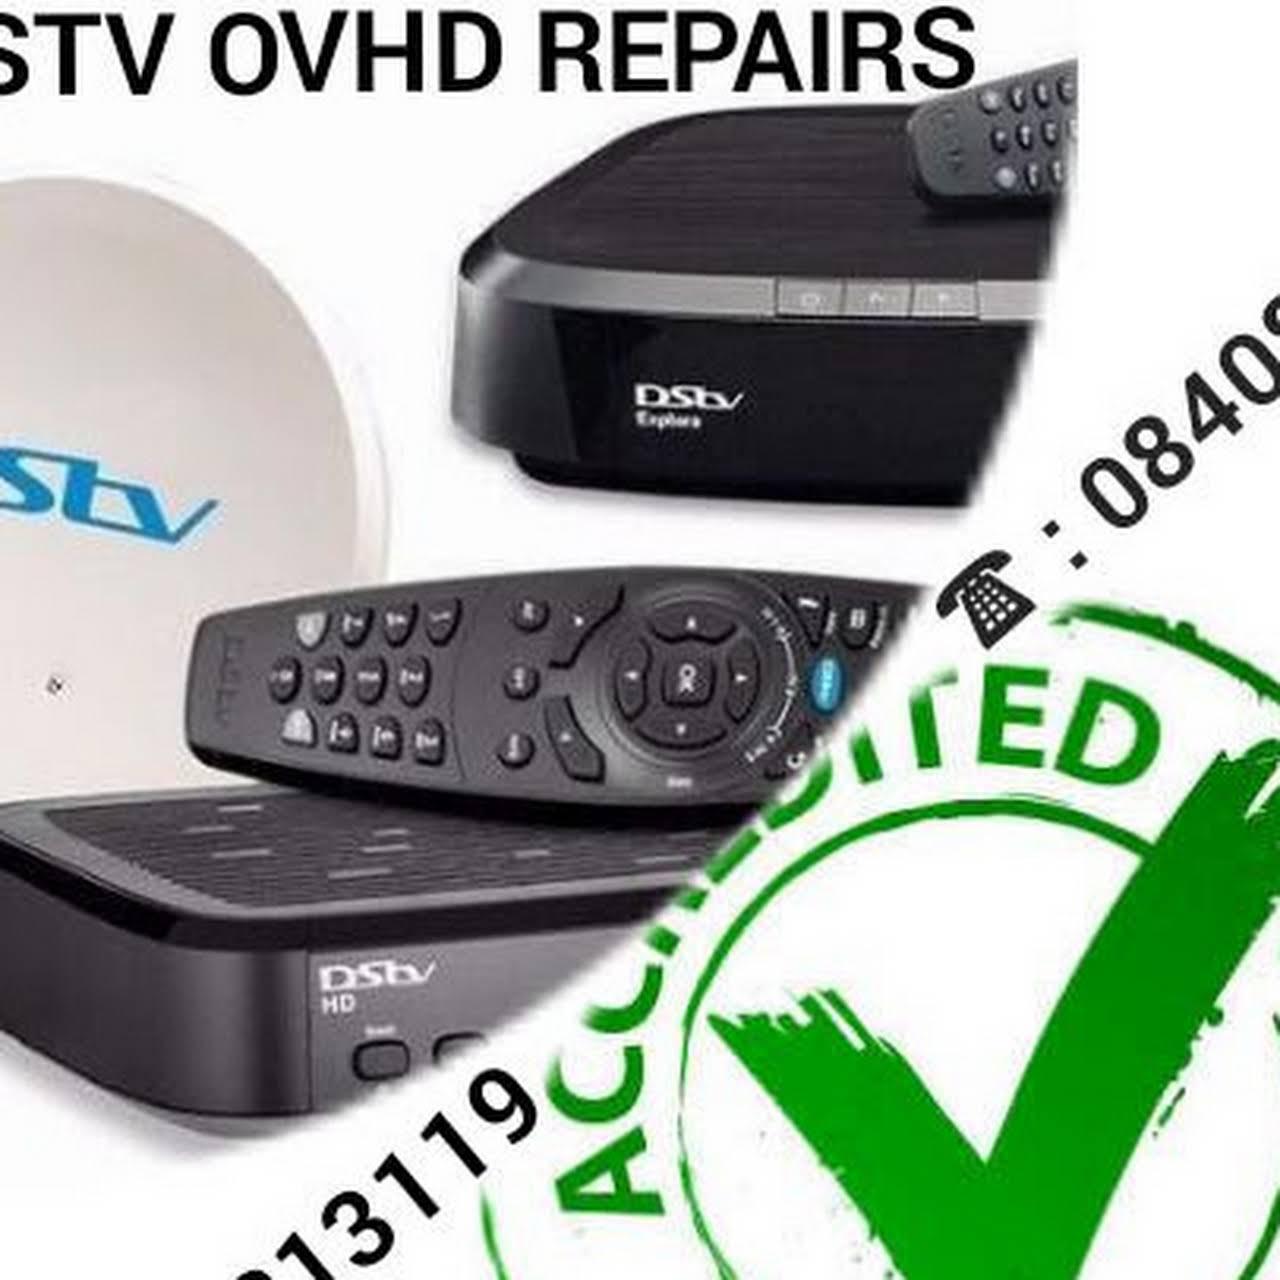 D stv & Ovhd installer & repairs - Dstv and ovhd repairs